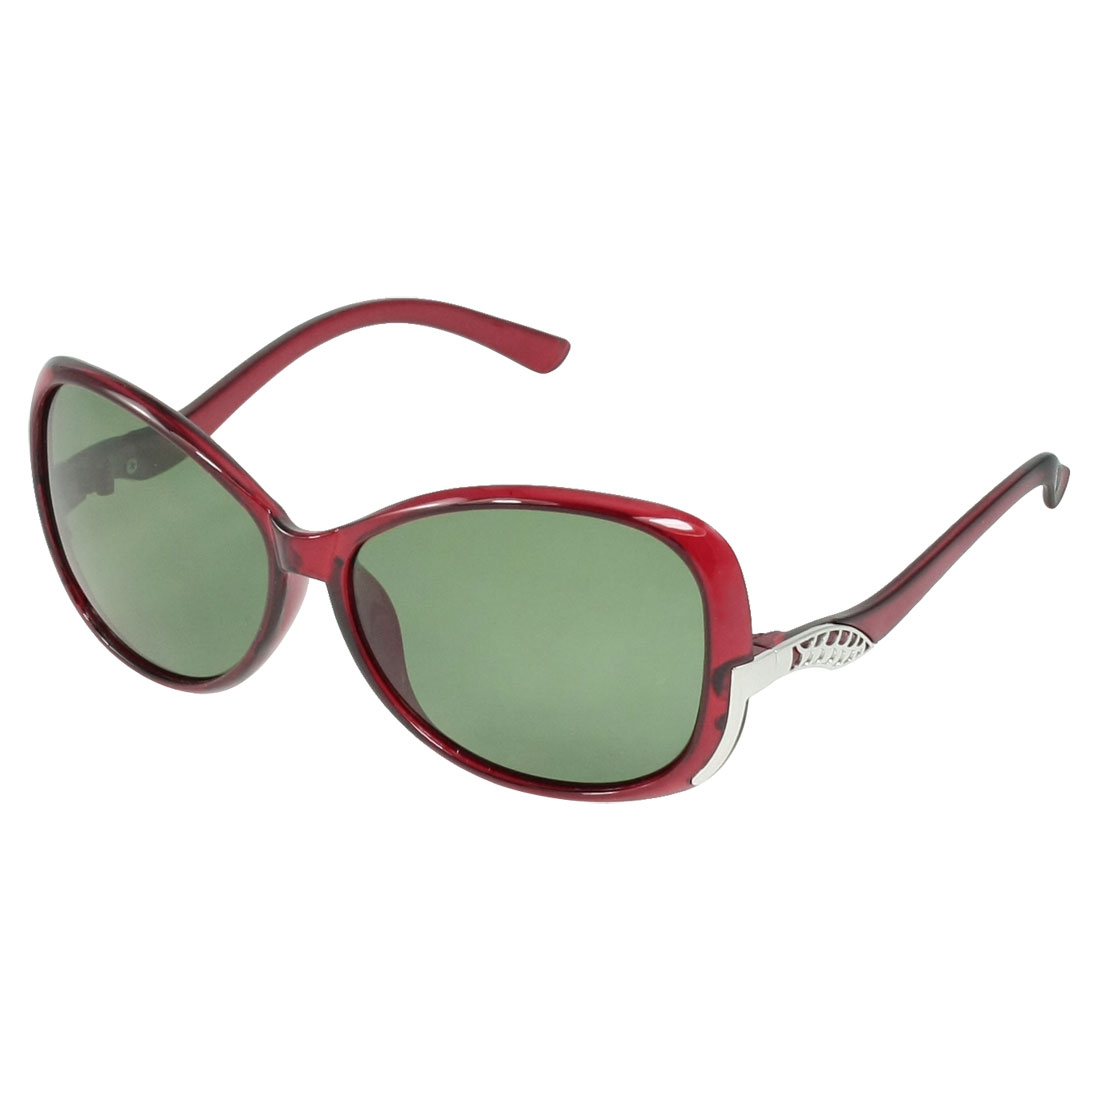 Lady Woman Green Lens Plastic Burgundy Full Frame Polarized Sunglasses